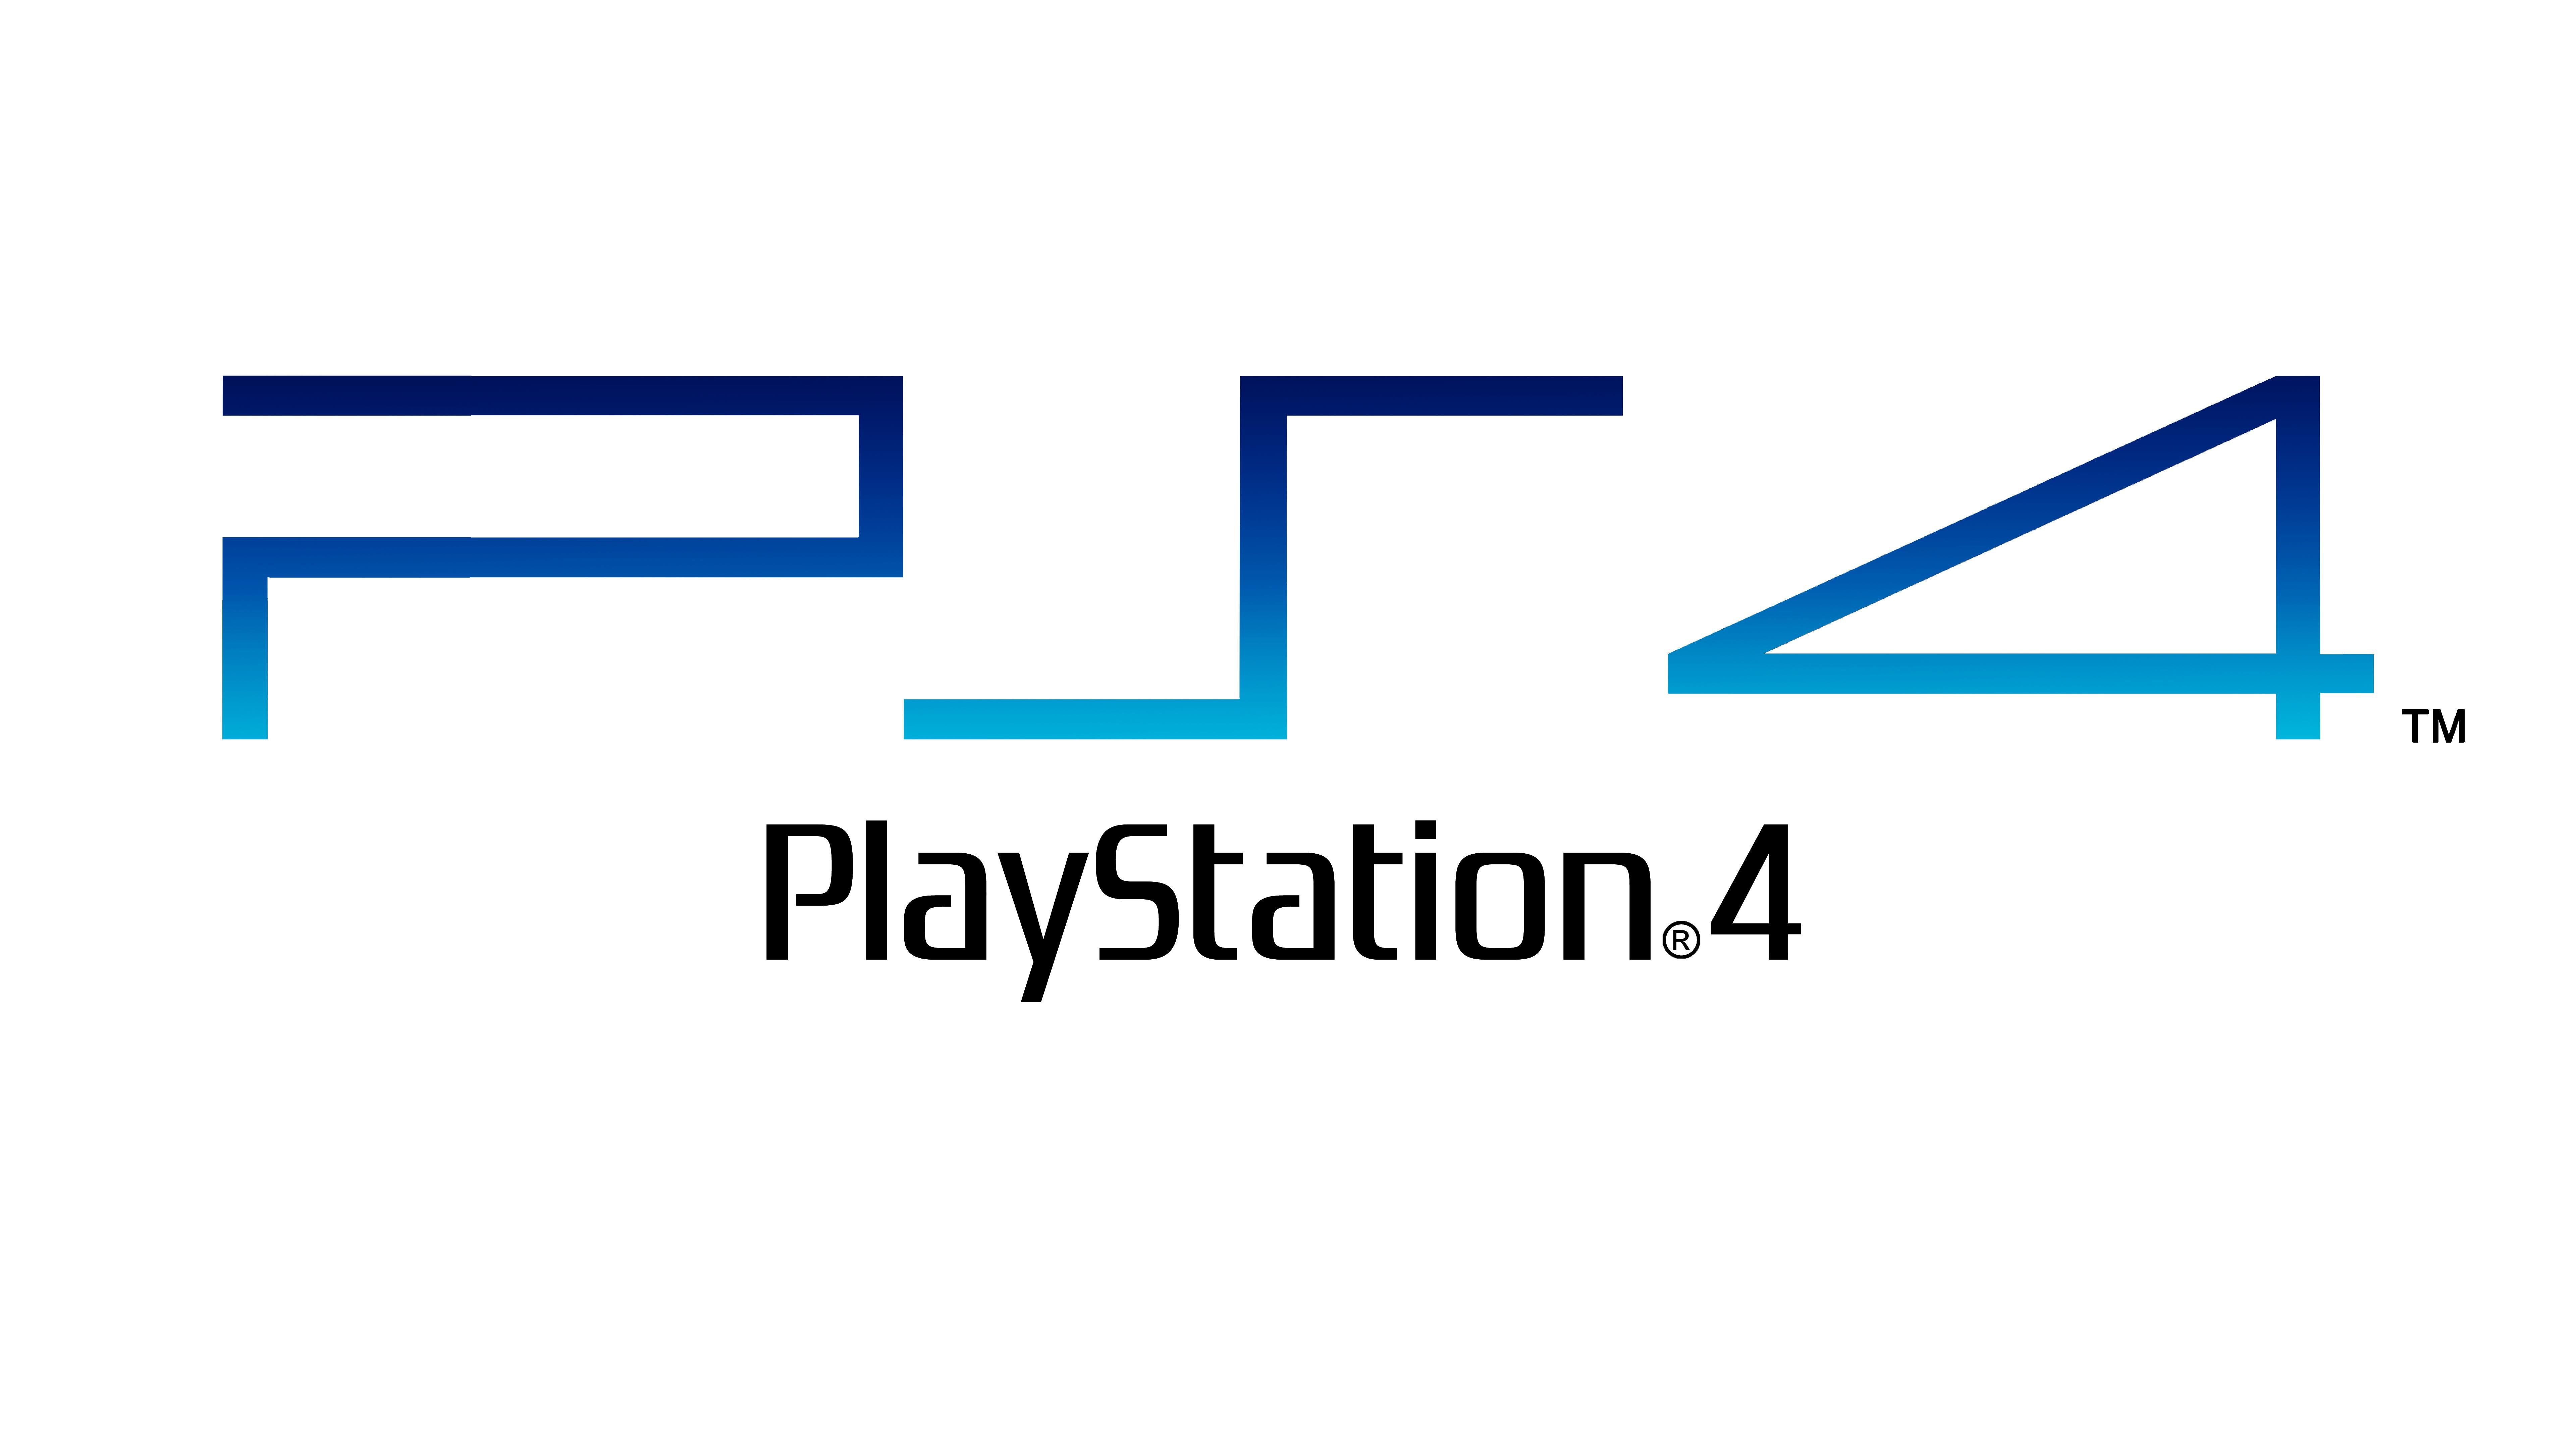 playstation 4 logo Google Search Playstation